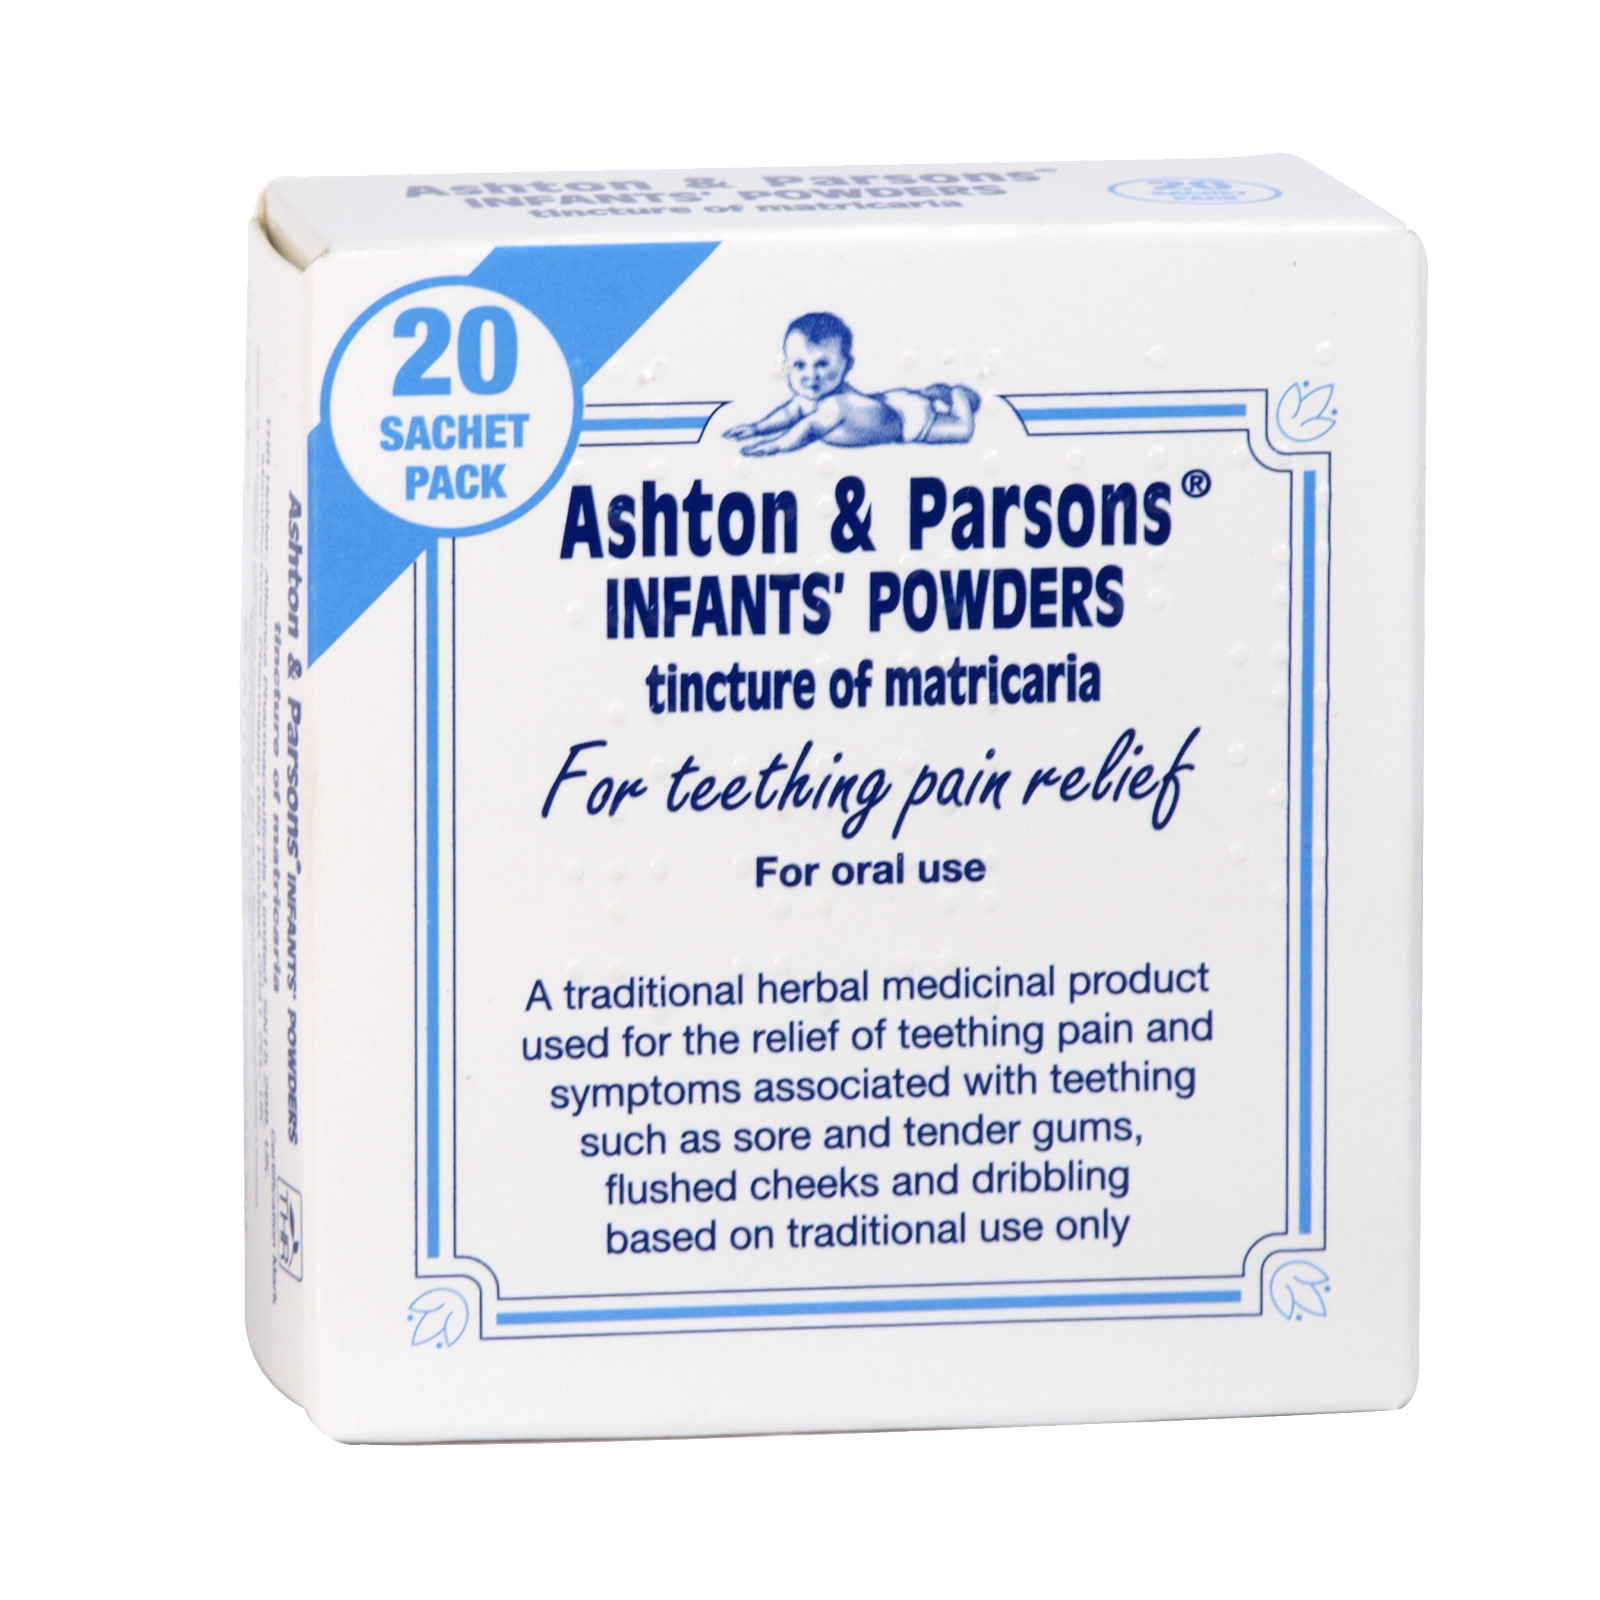 ASHTON & PARSONS 20 INFANT POWDERS (NON RETURNABLE)